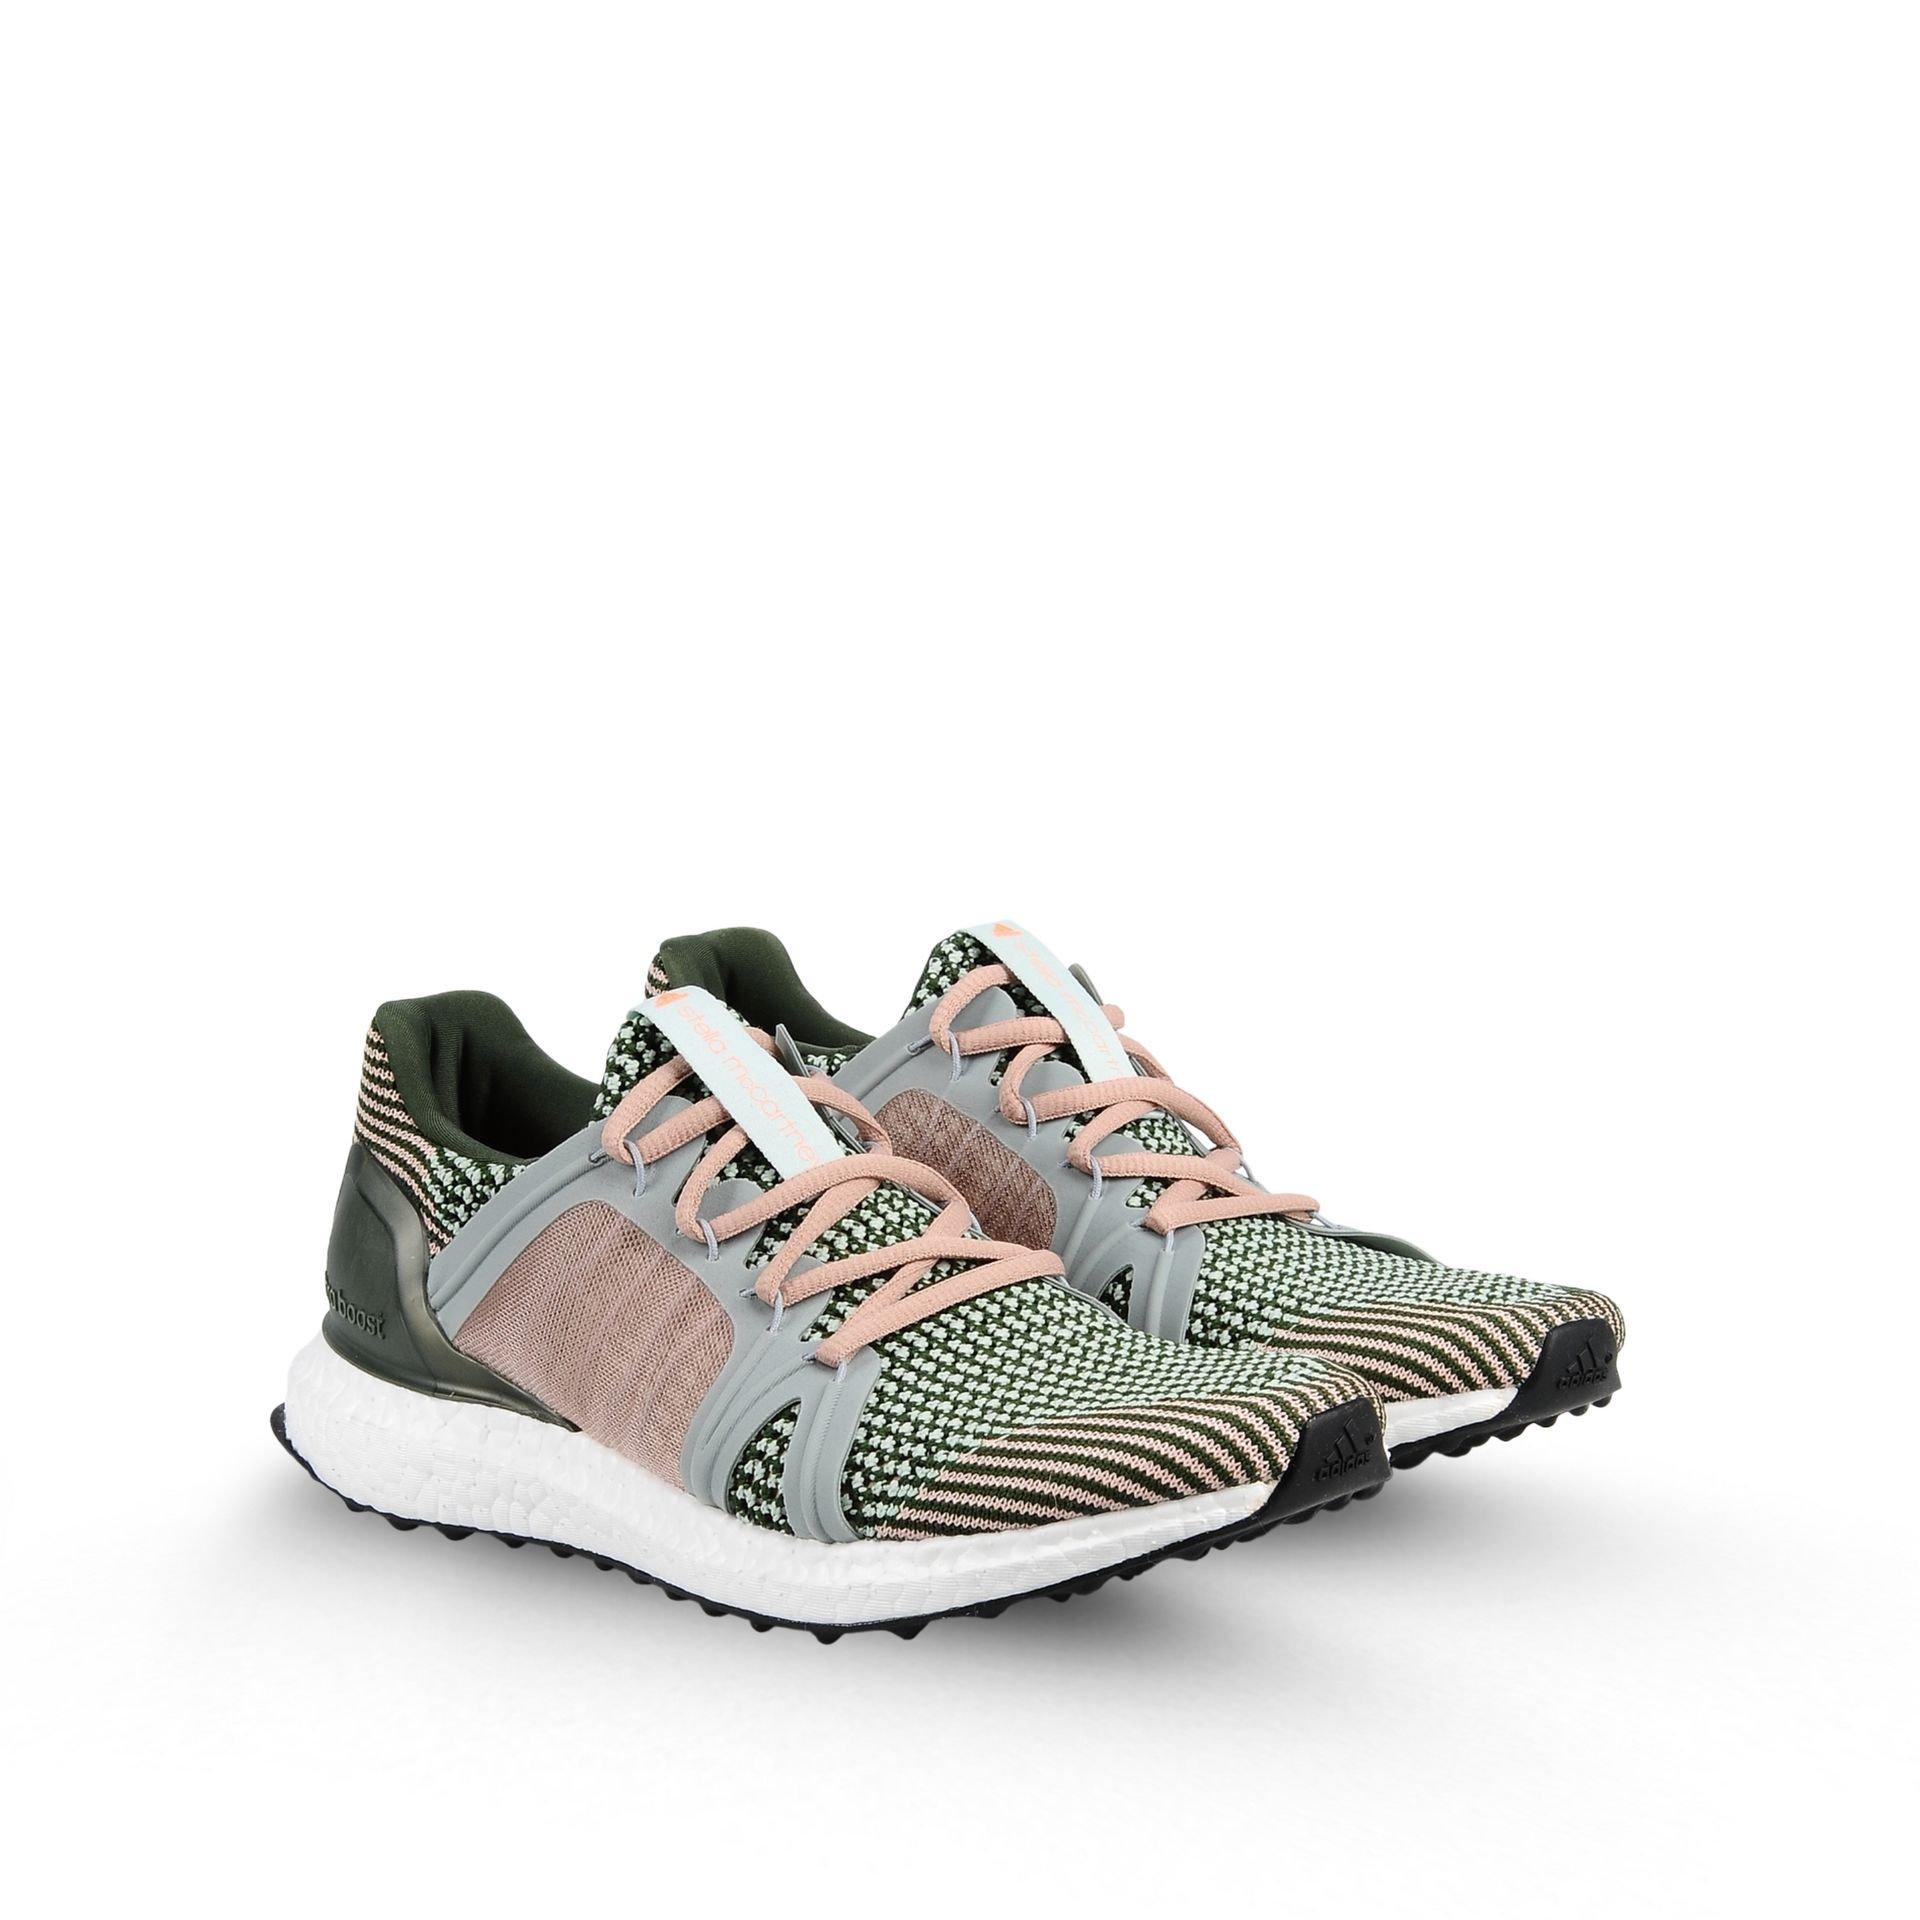 Stella Mccartney Shoes Adidas